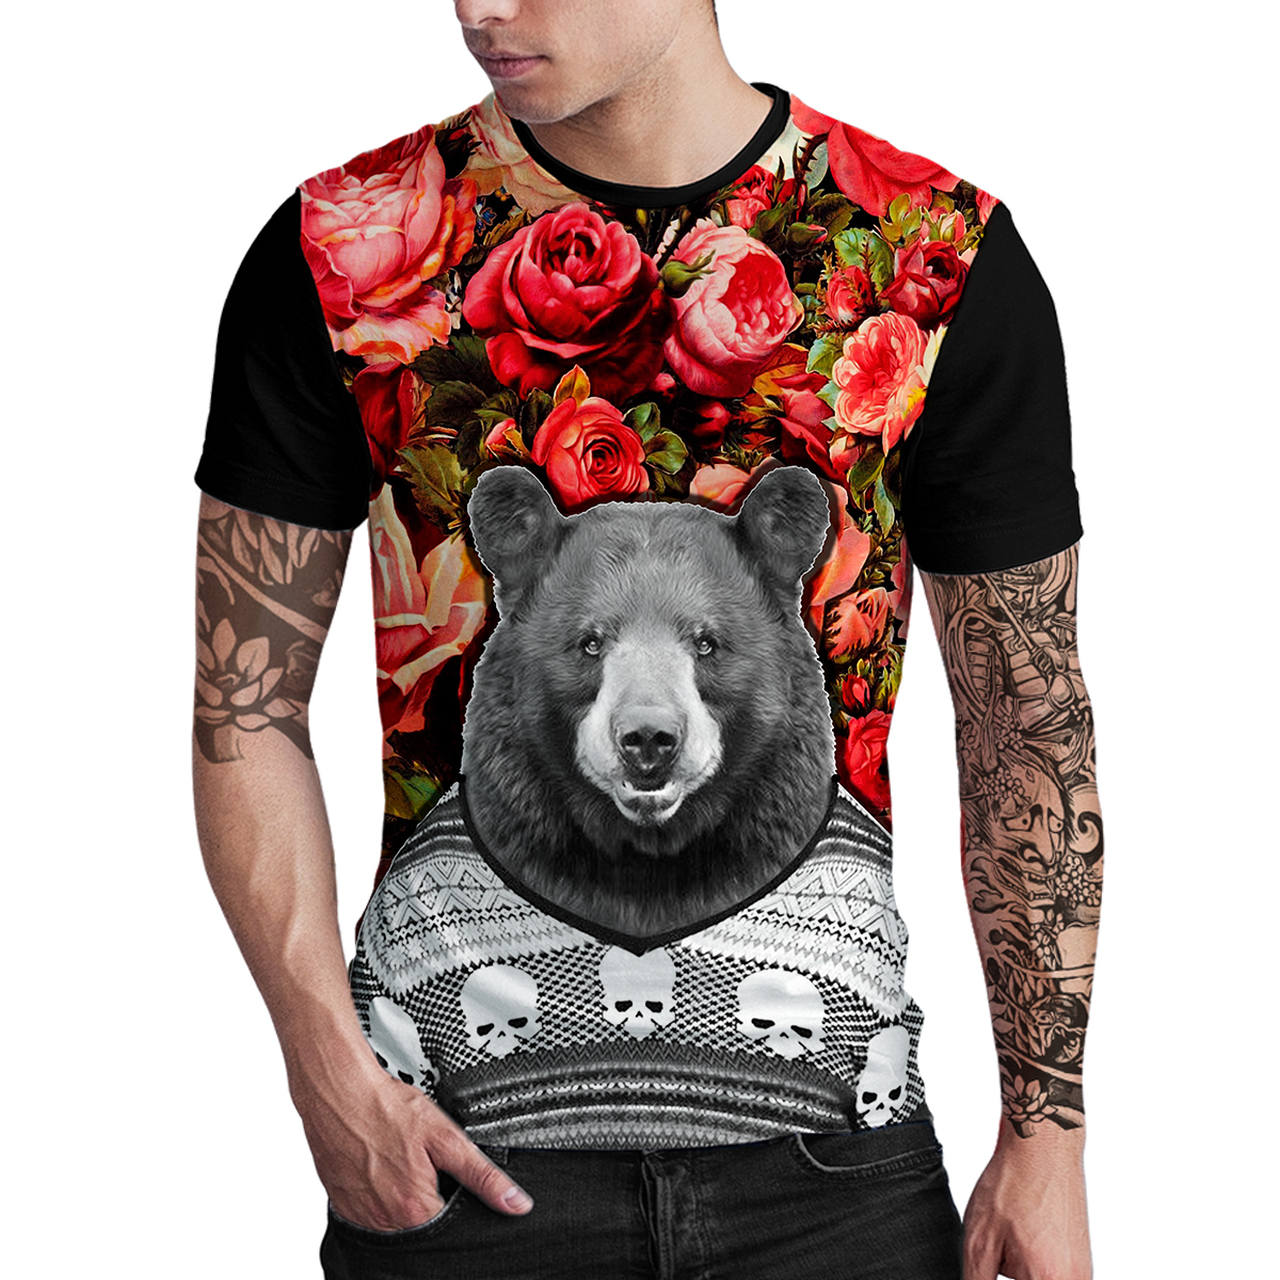 Stompy Camiseta Estampada Masculina Modelo 90